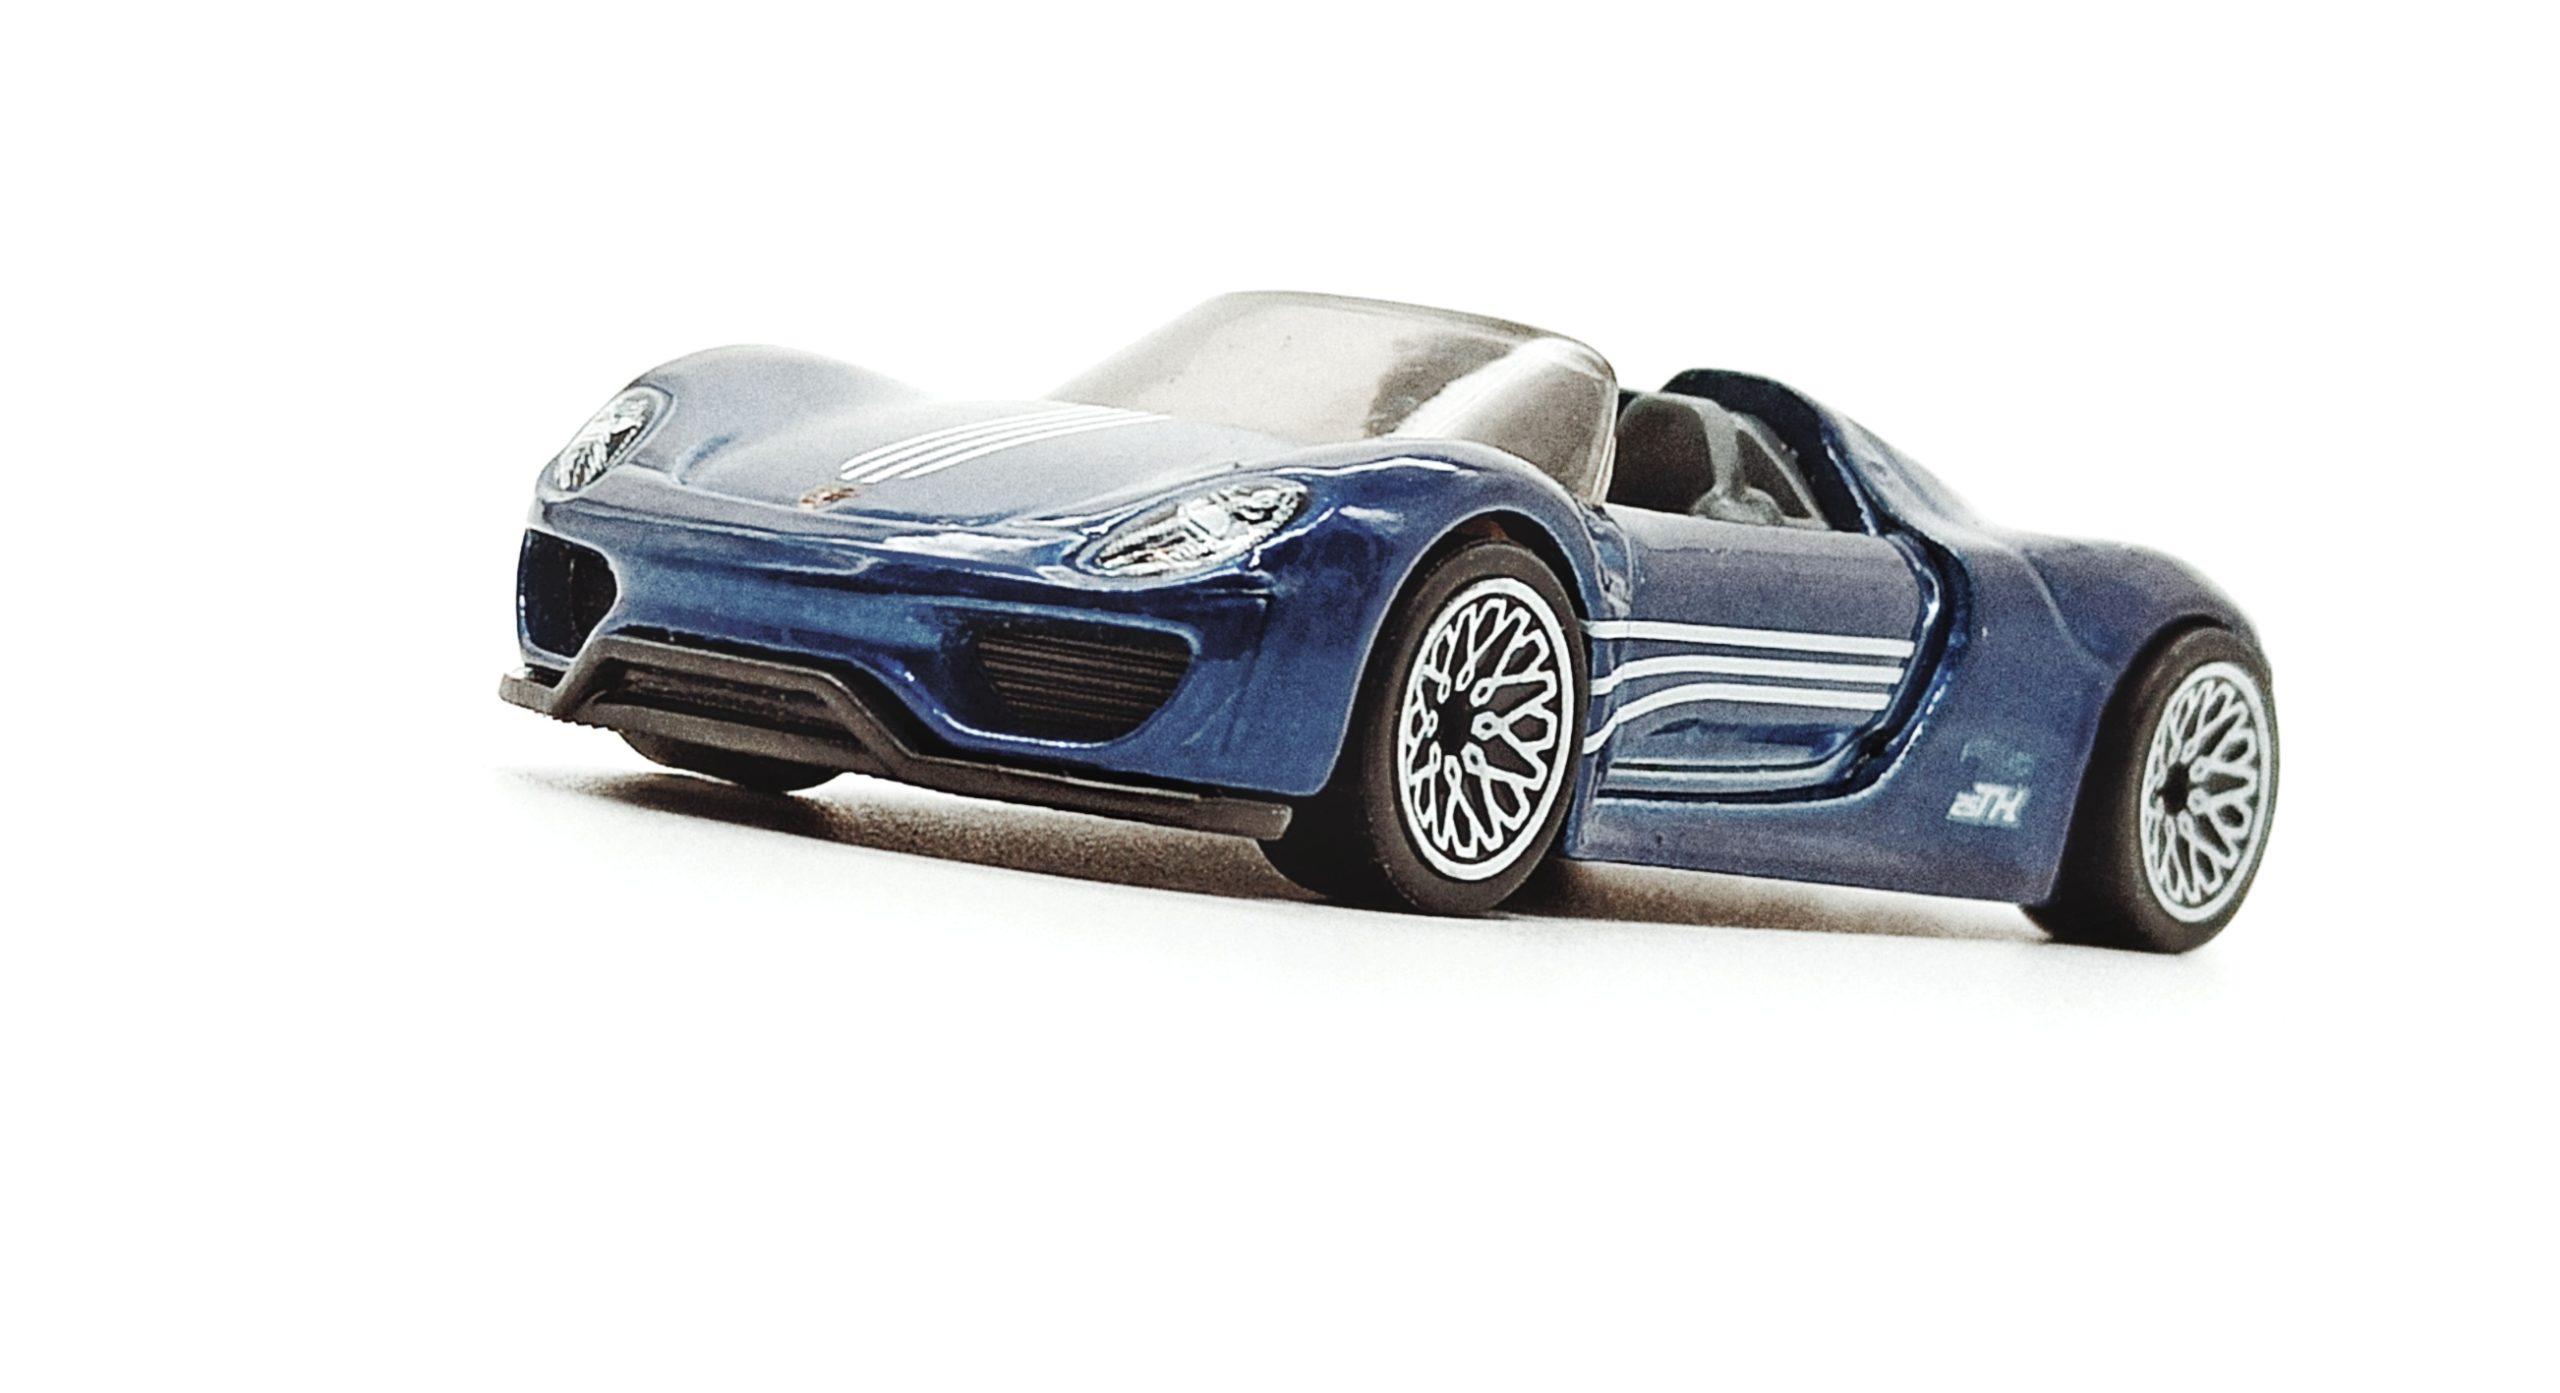 Hot Wheels Porsche 918 Spyder (2018 model) (GHG26) 2020 (94/250) Porsche (5/5) spectraflame blue Super Treasure Hunt (STH) side angle